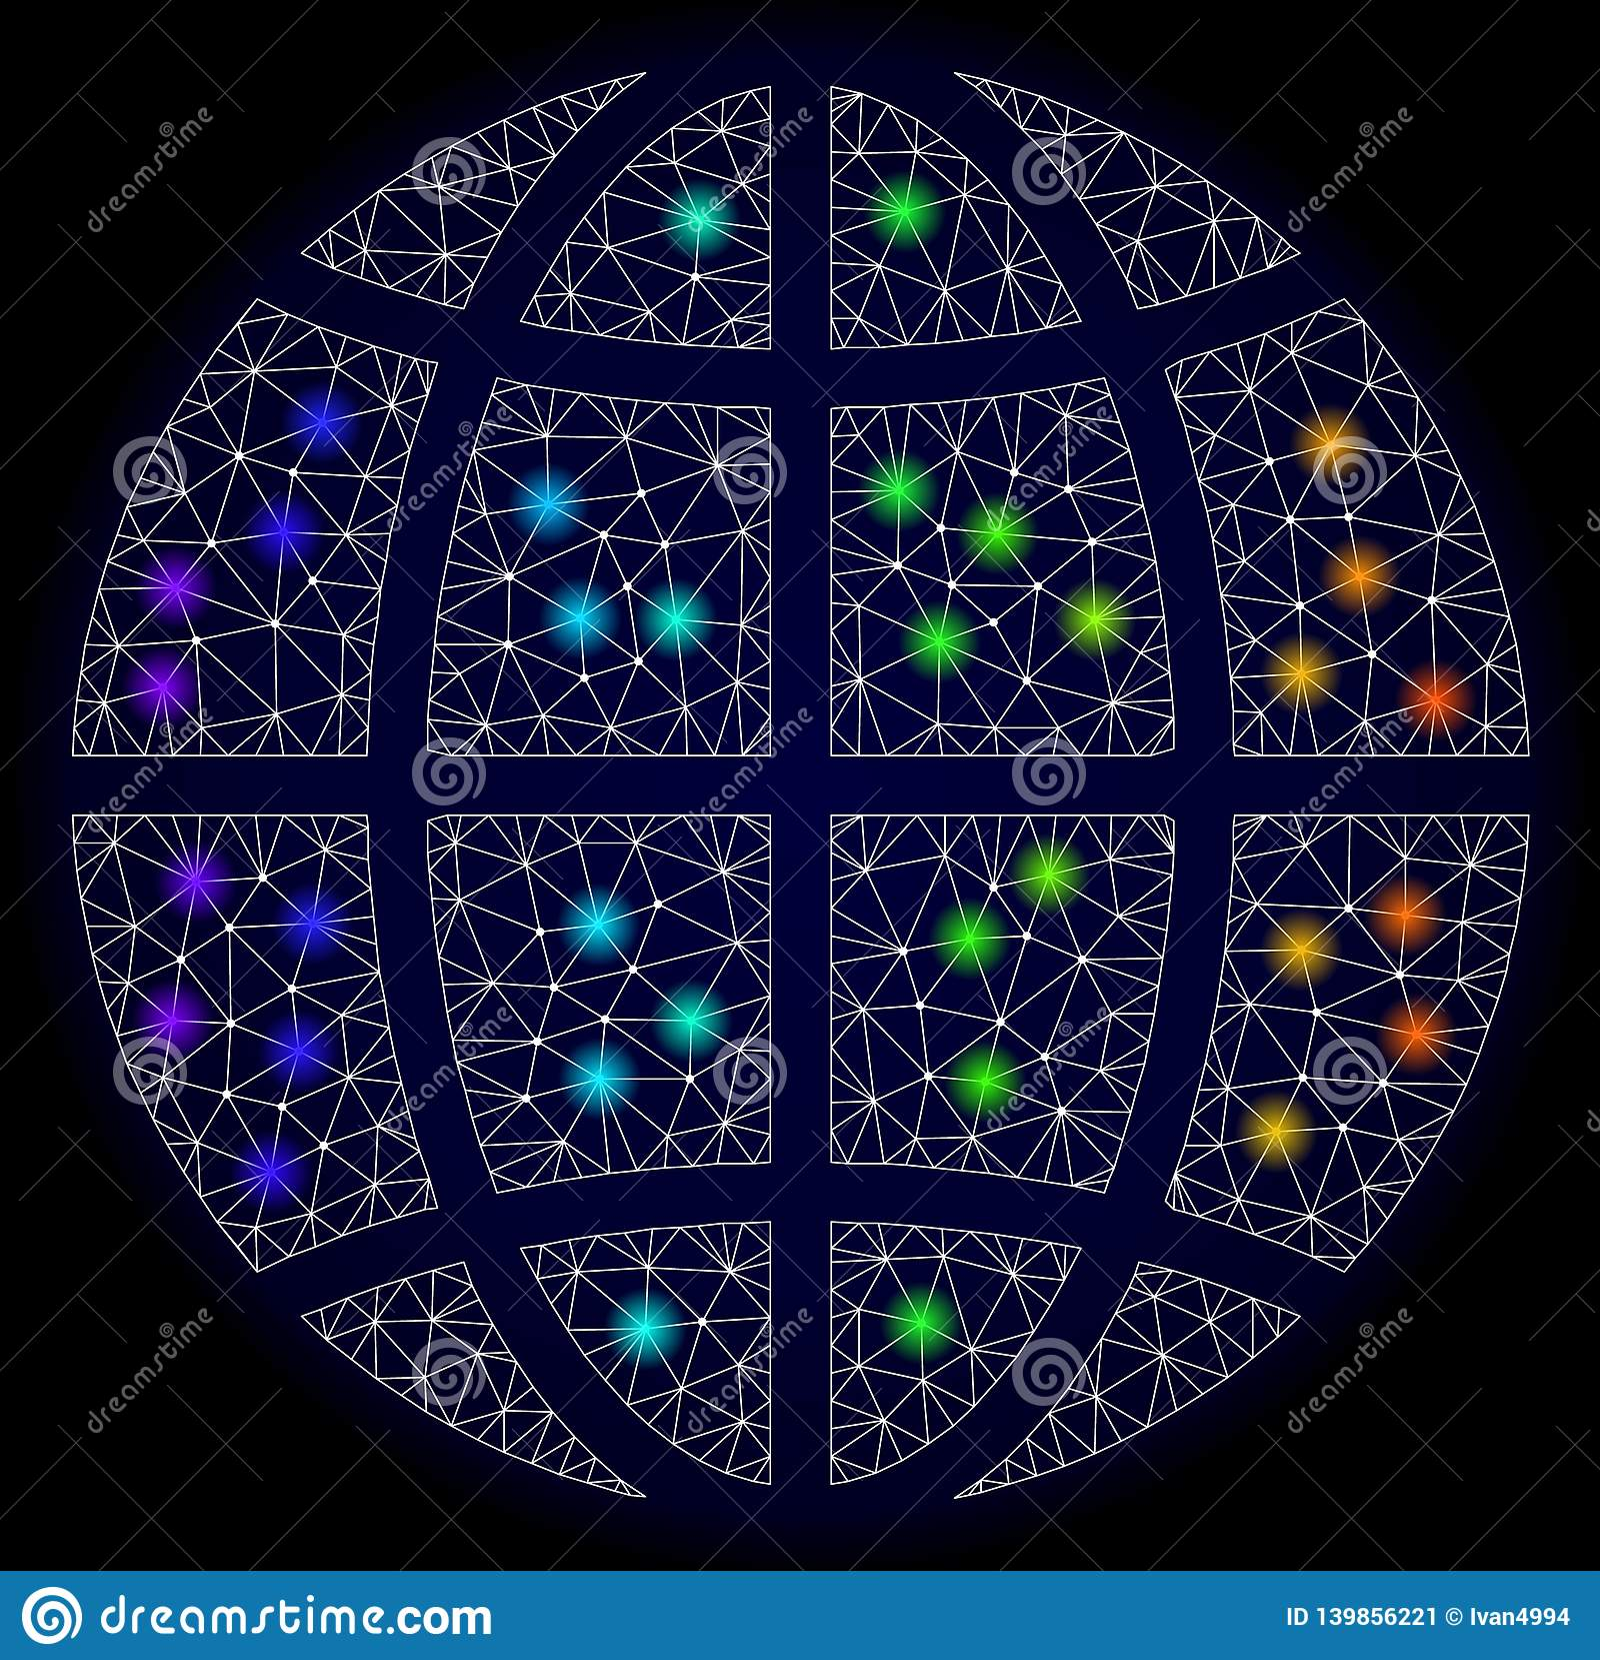 Polygonale Karkasse Mesh Map der Planeten-Kugel mit hellen hellen Stellen